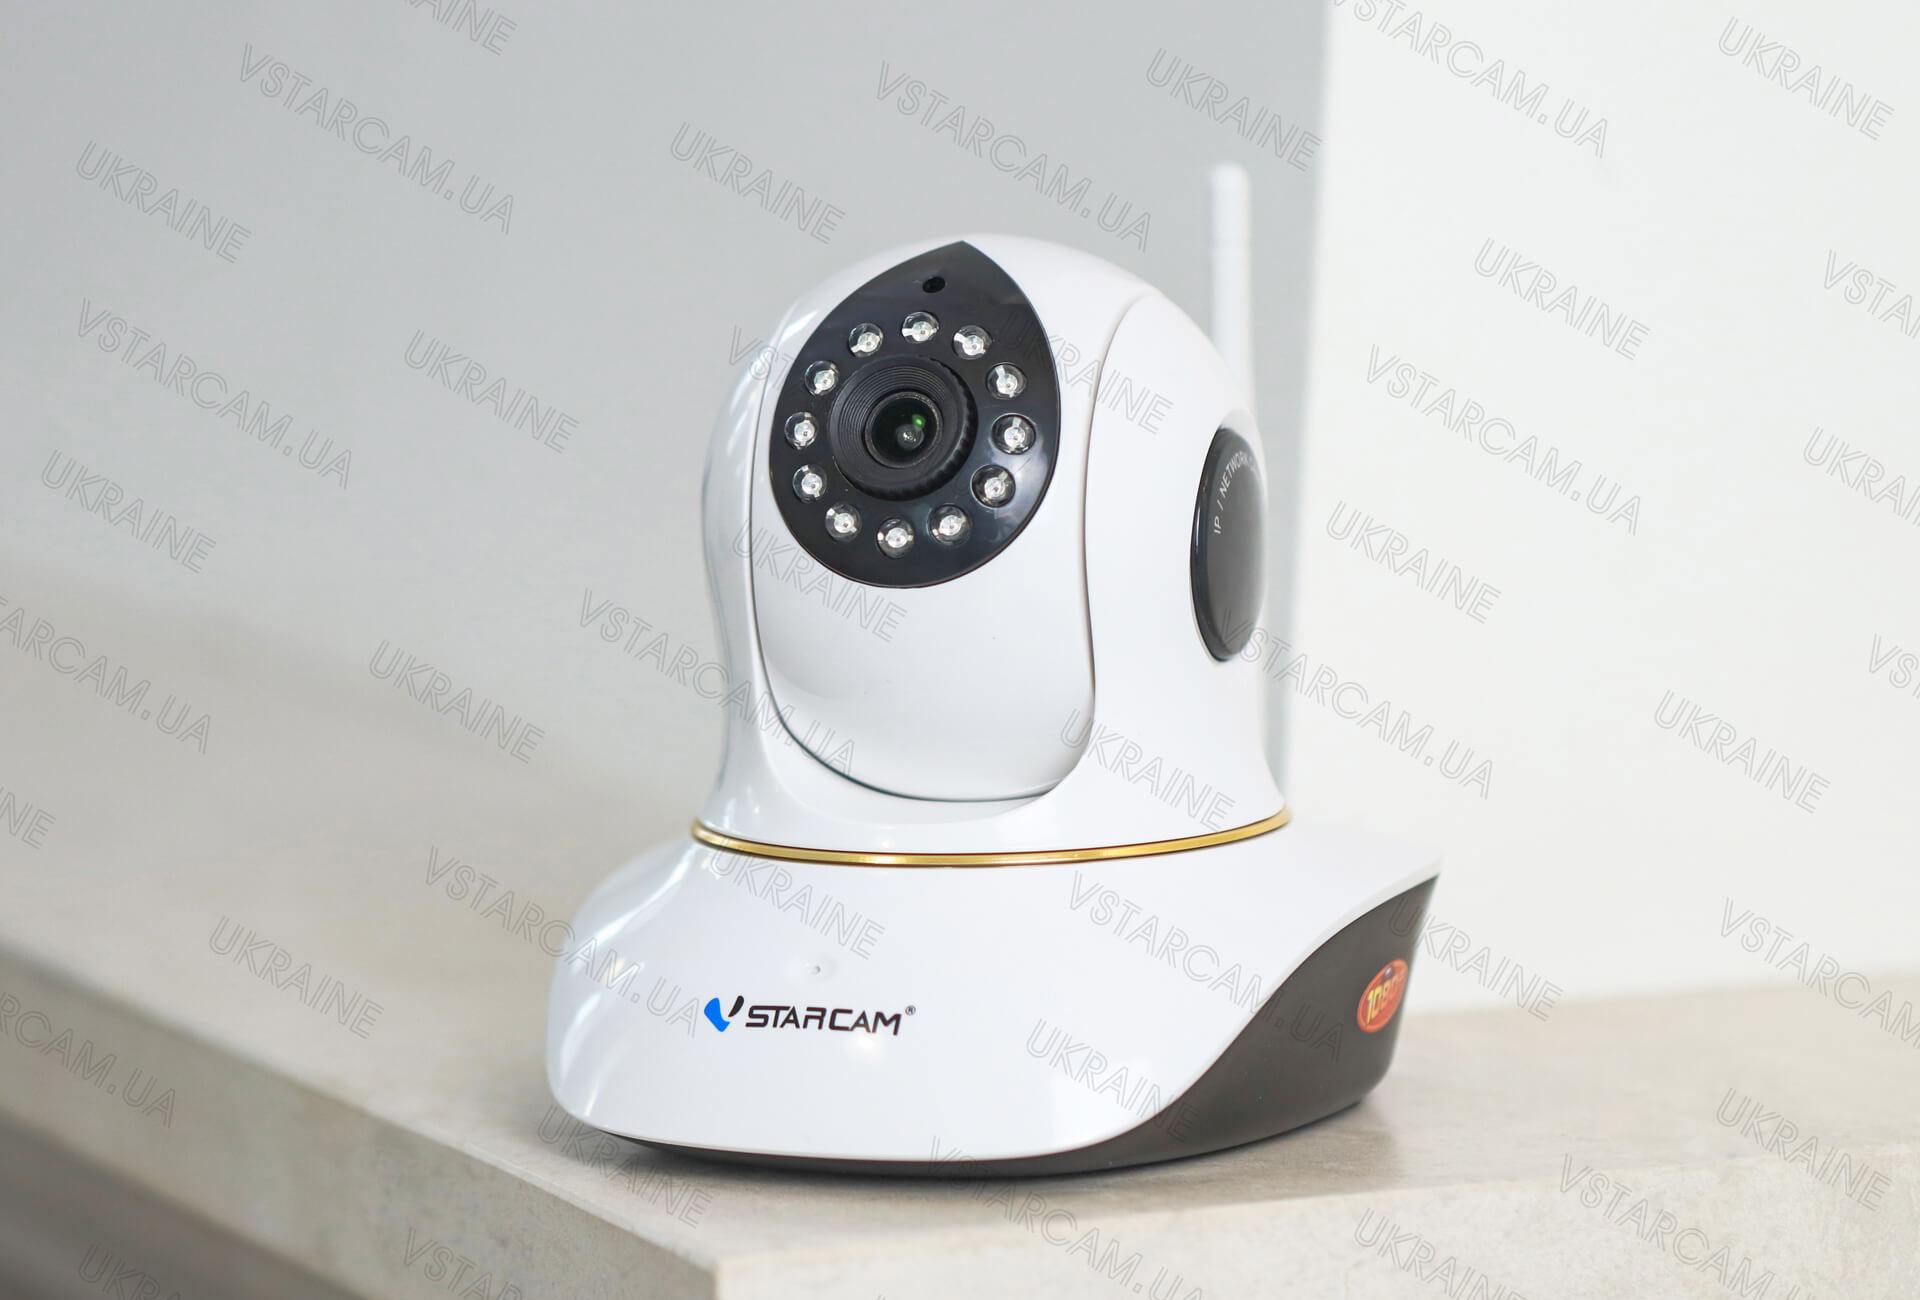 ip-camera-vstarcam-c38s-ukraine-1.jpg